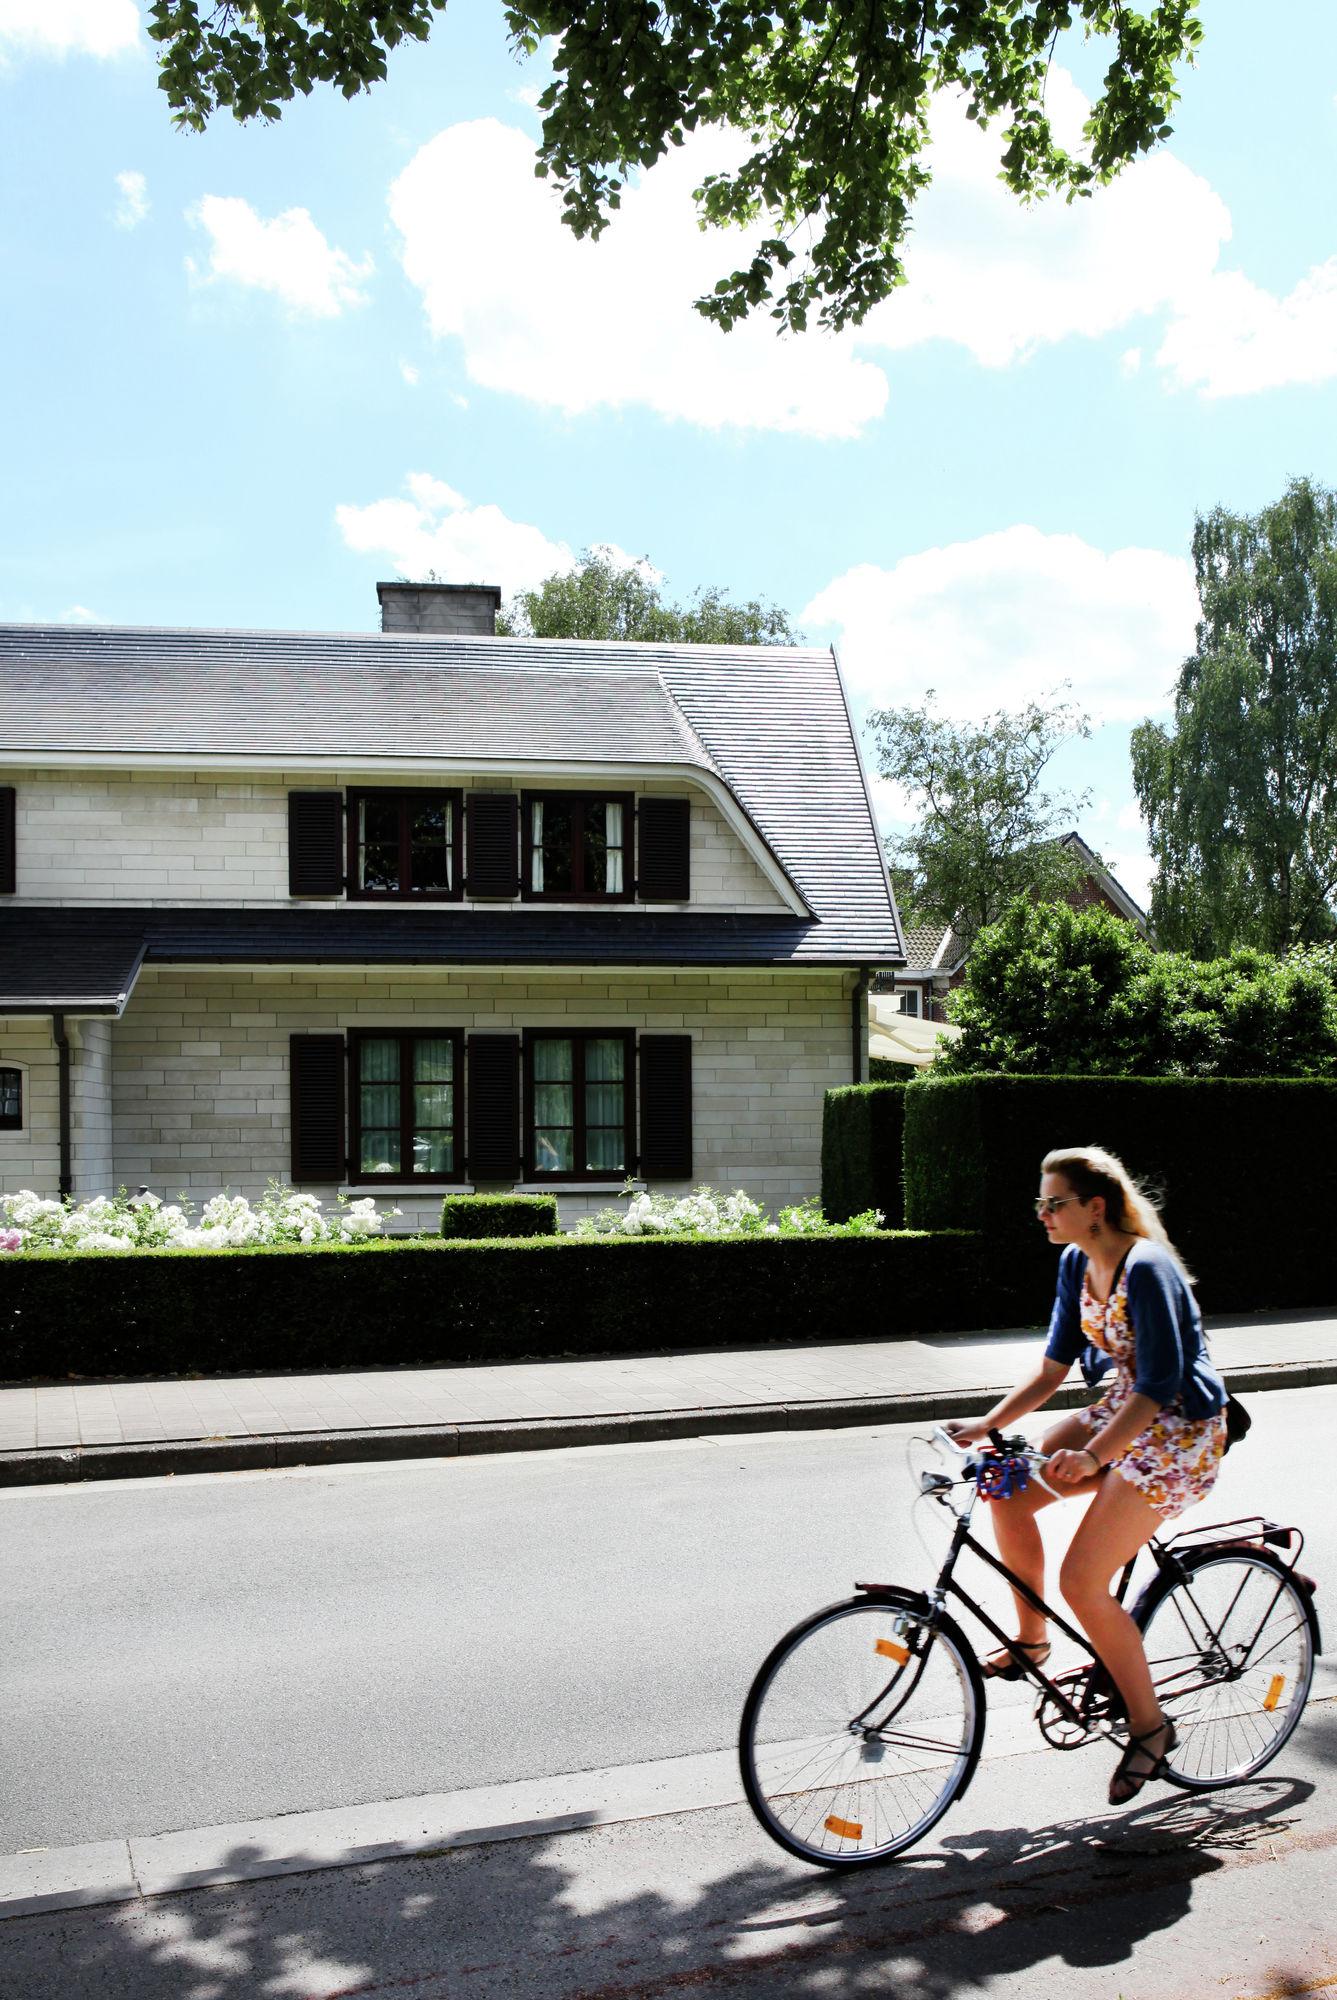 patijntjesstraat voortuintjes(8)©Layla Aerts.jpg